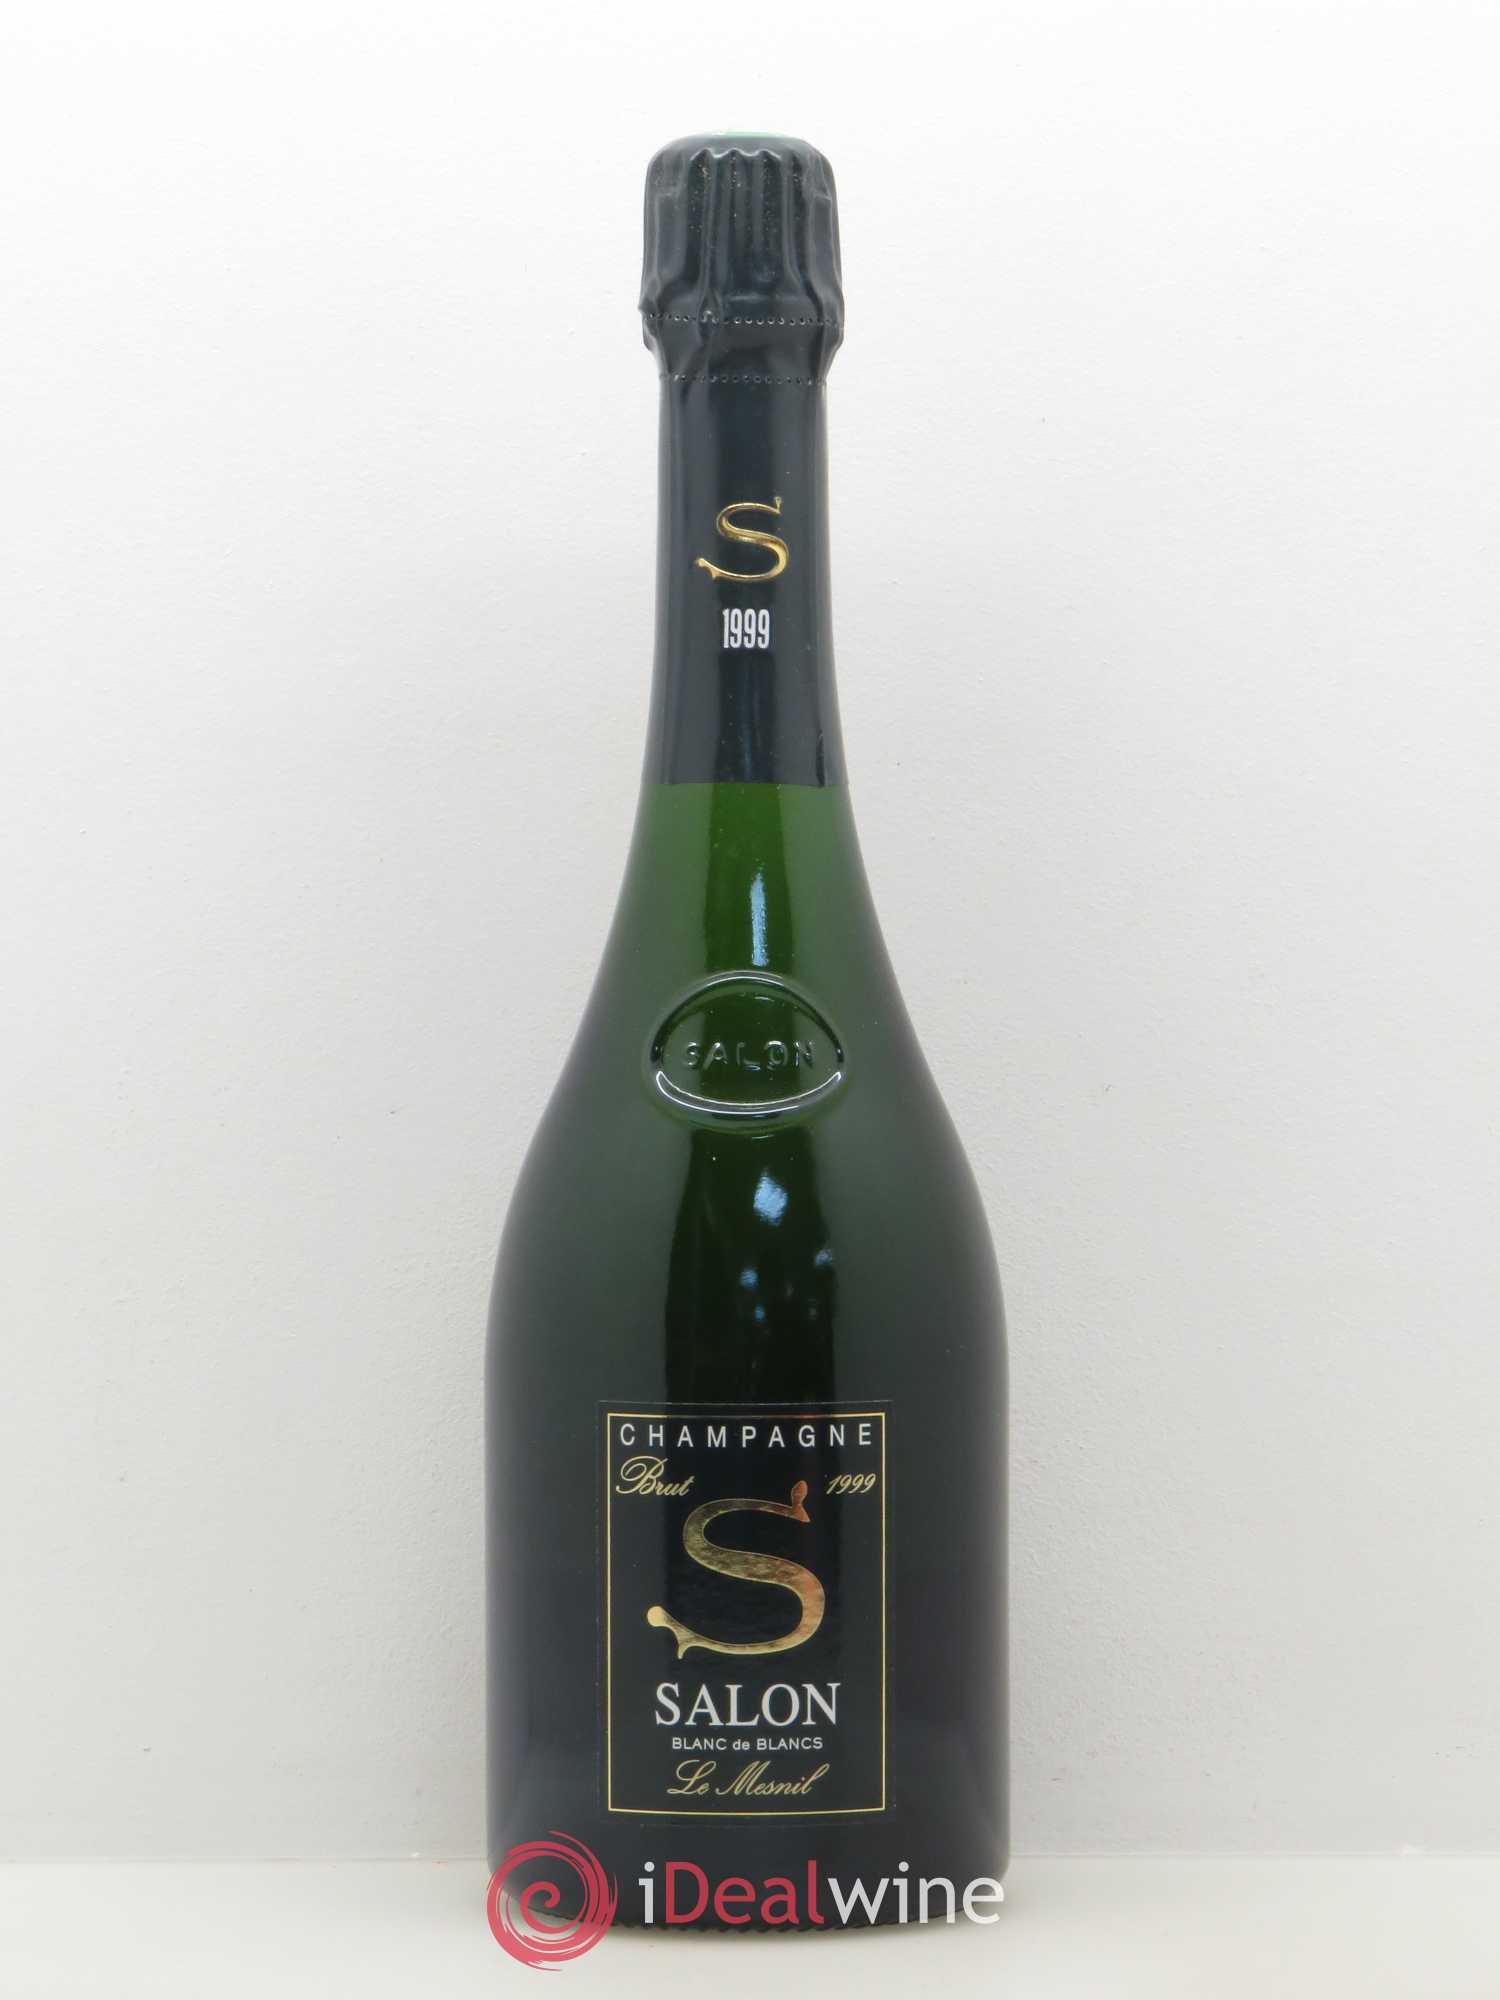 Buy Cuvée S Salon 1999 (lot: 2551)